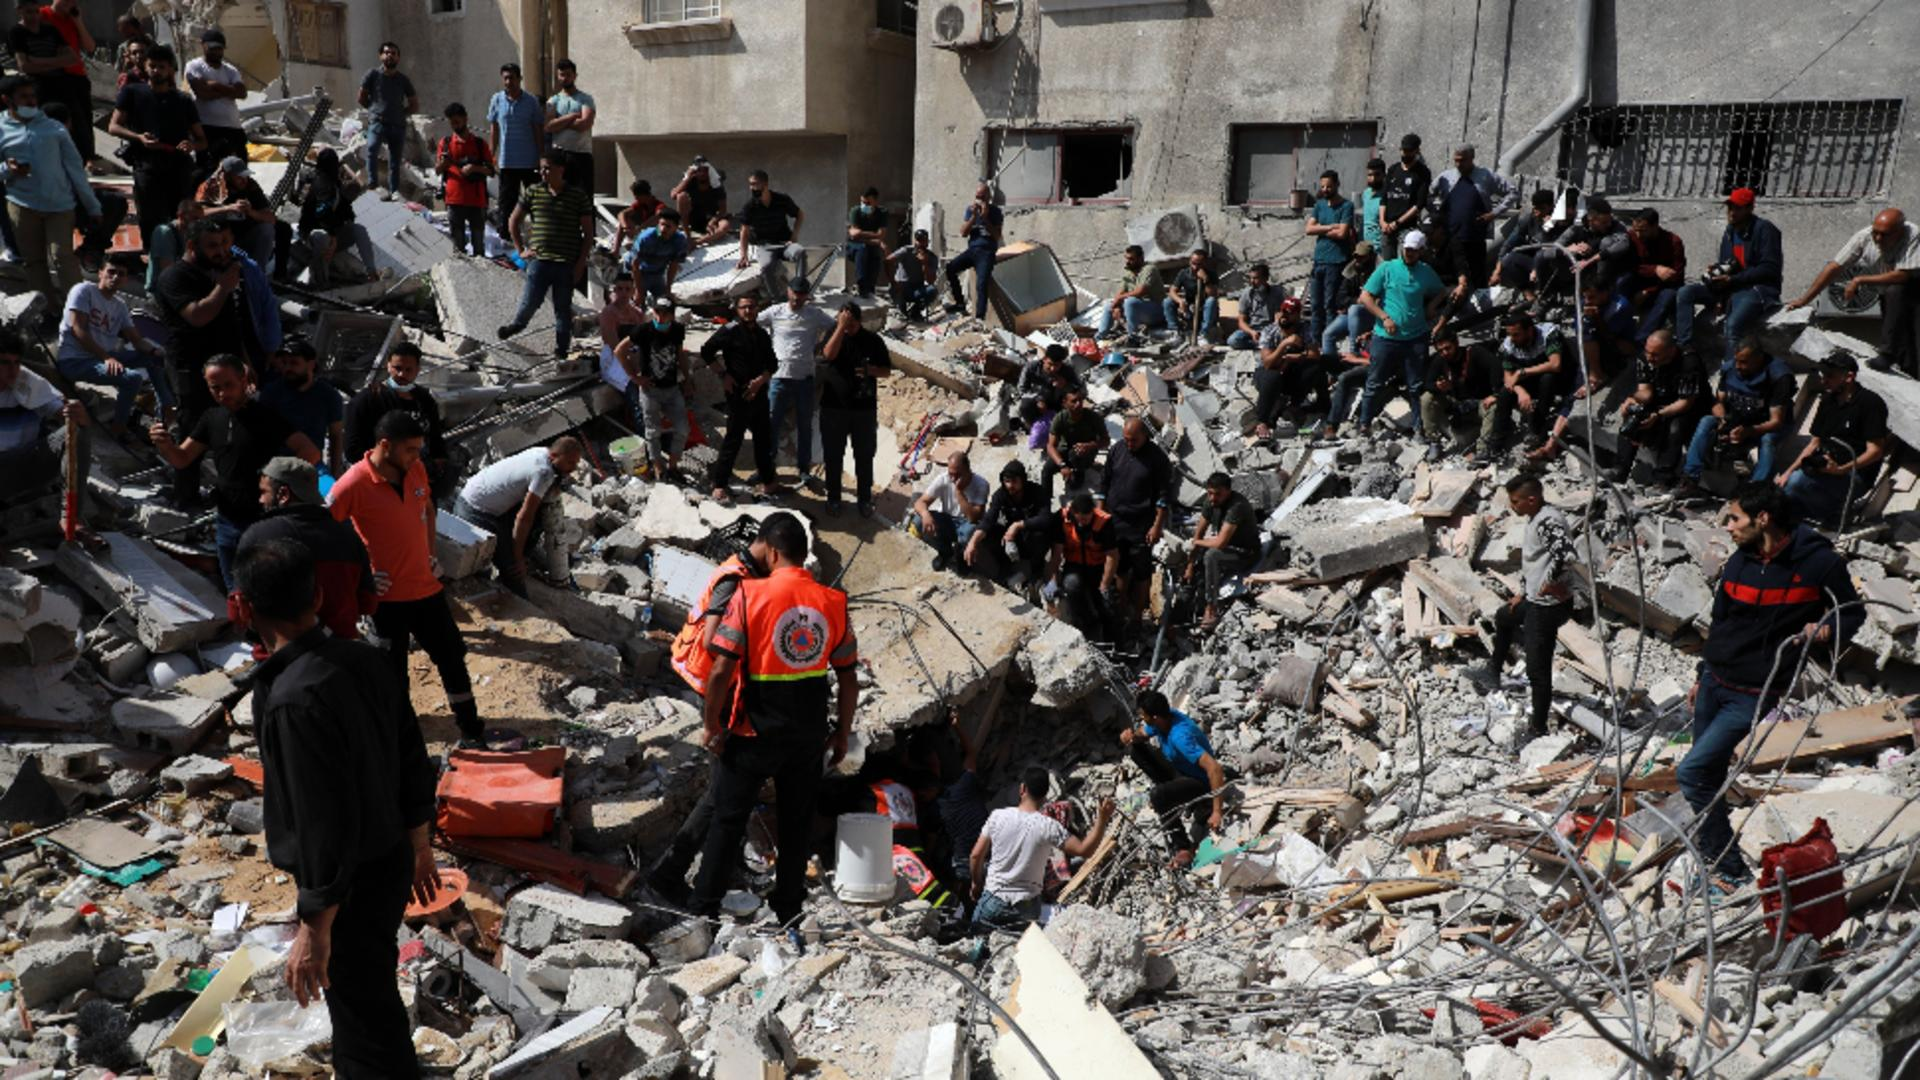 Violențe israeliano-palestiniene / Foto: Profi Media